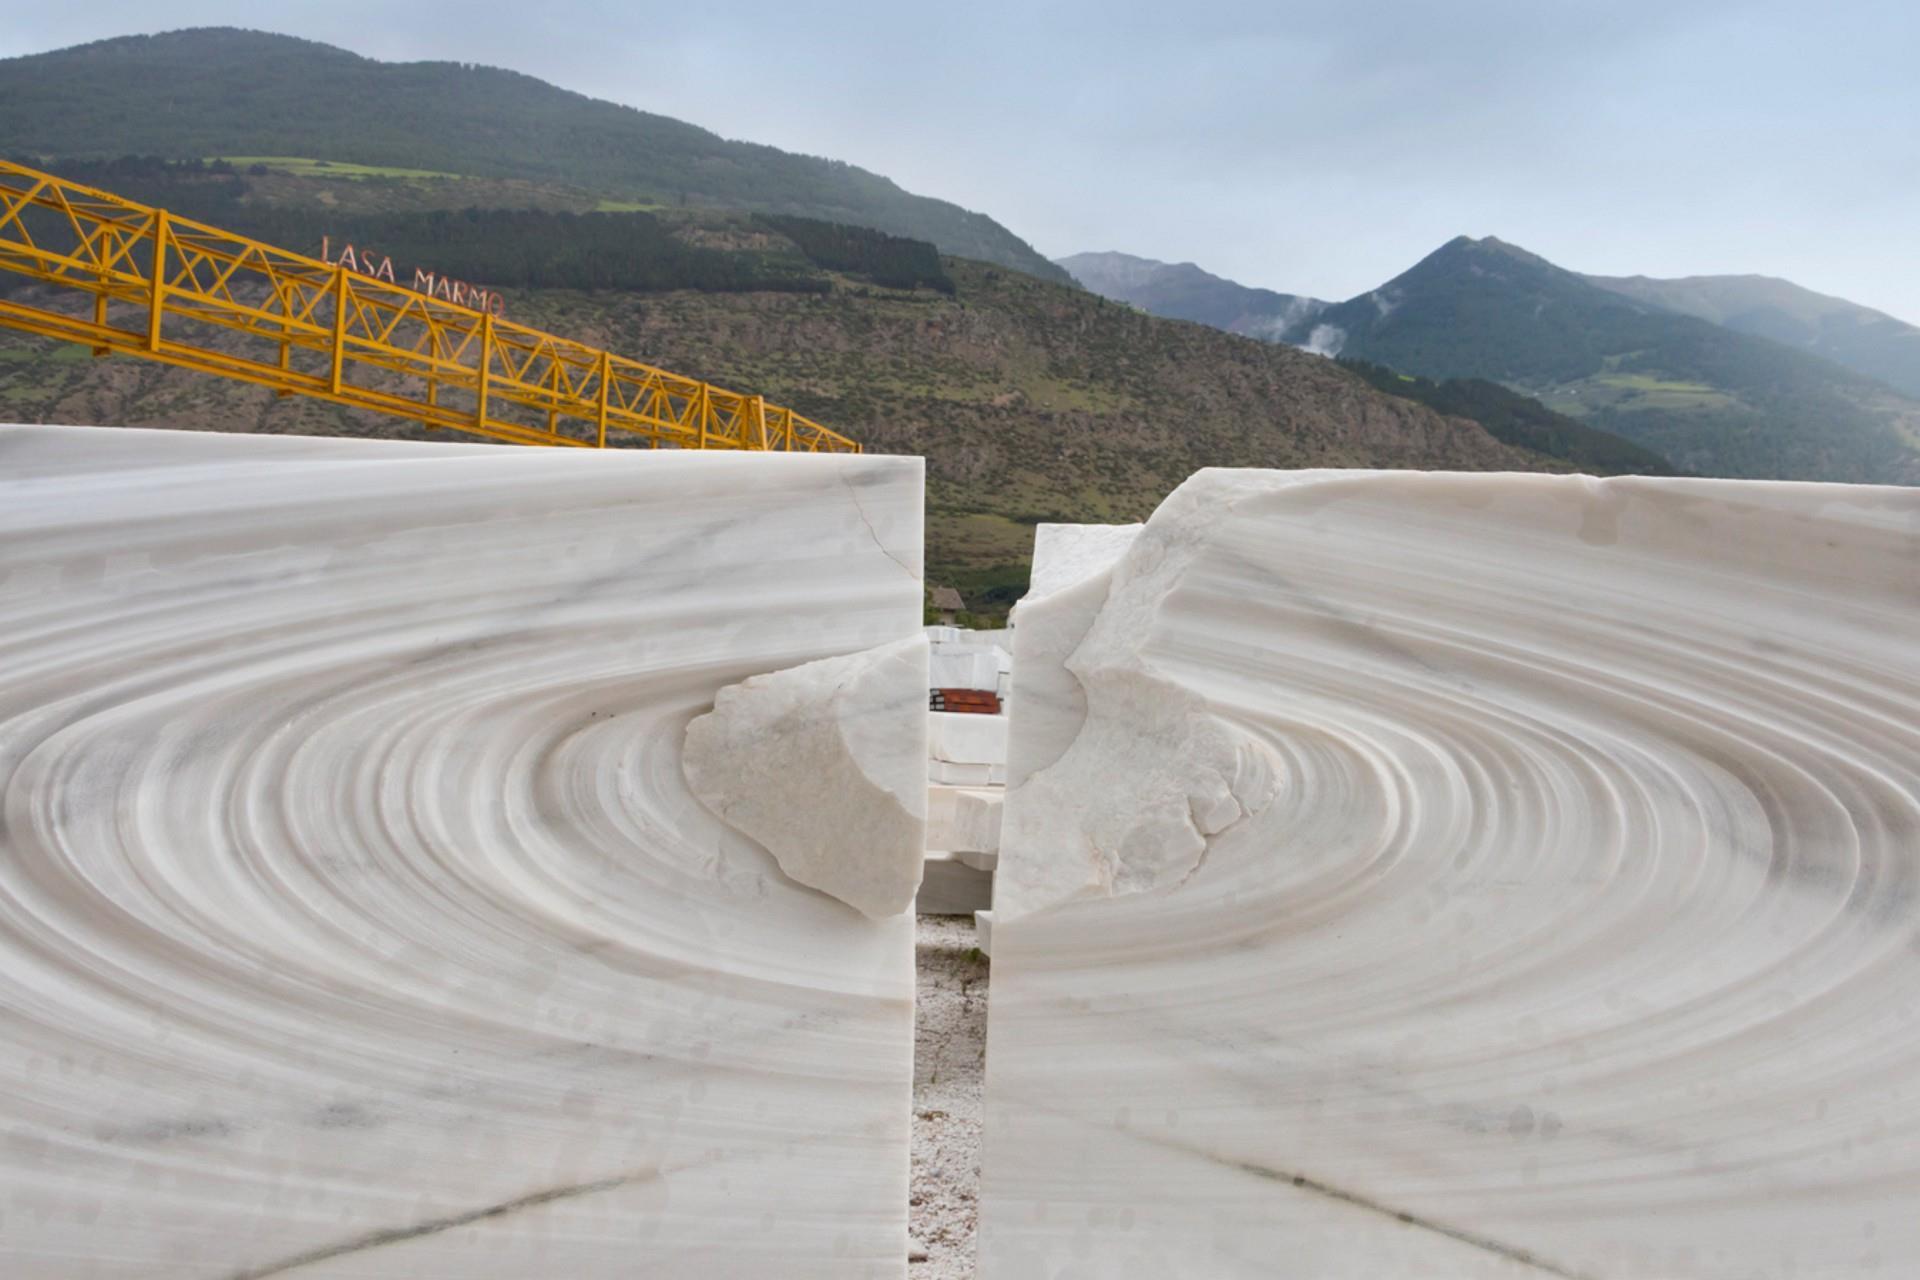 Lasa marble